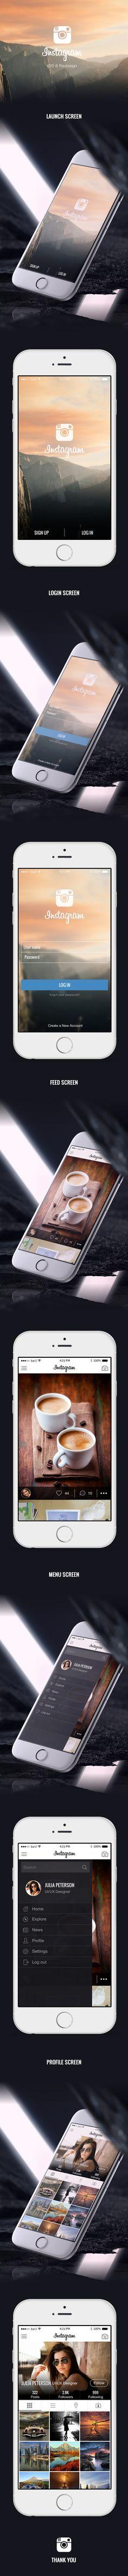 Instagram redesign for iOS 8